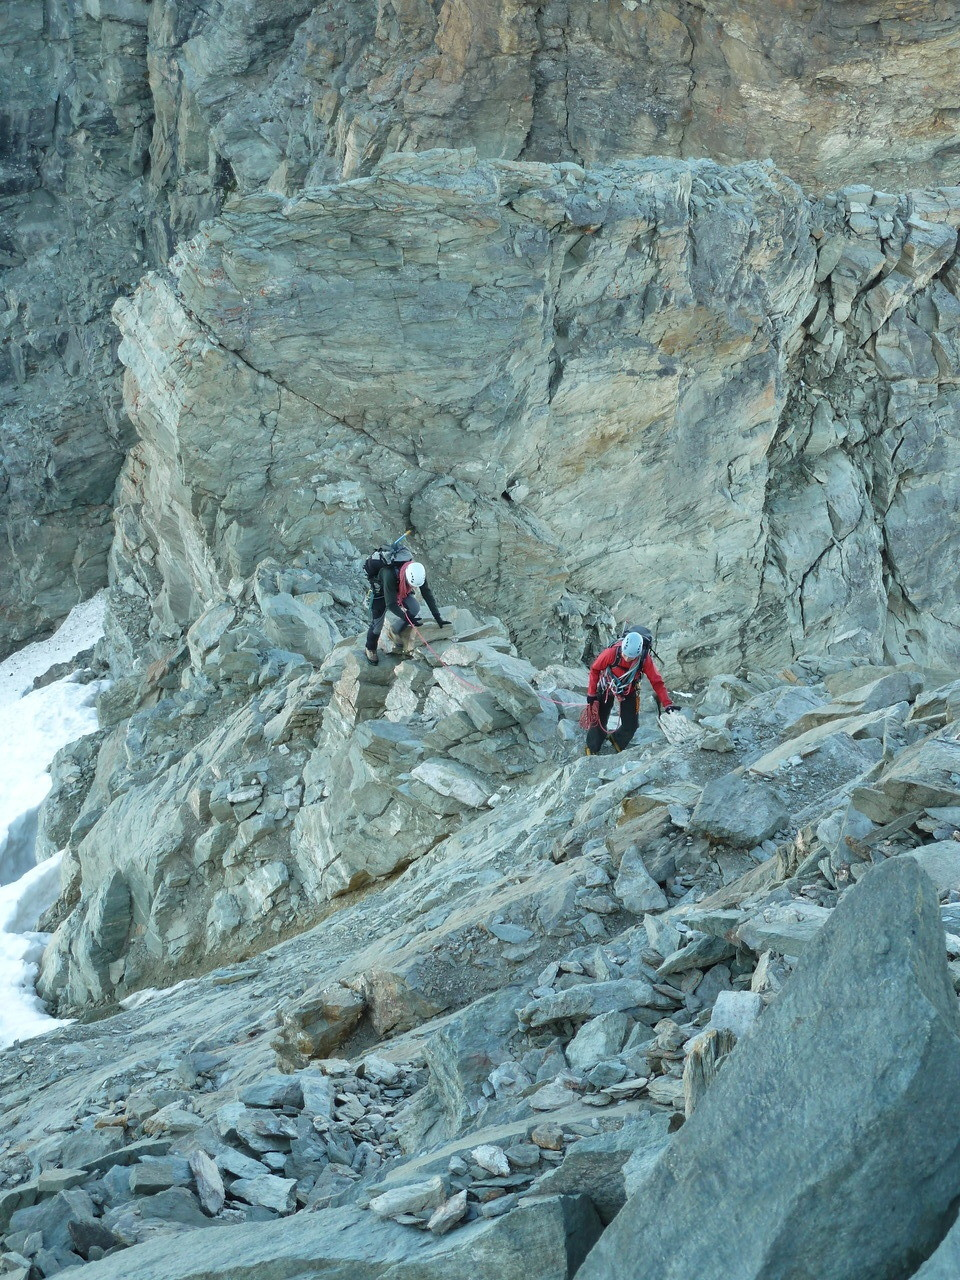 Montée au Tschingelhorn par les rochers